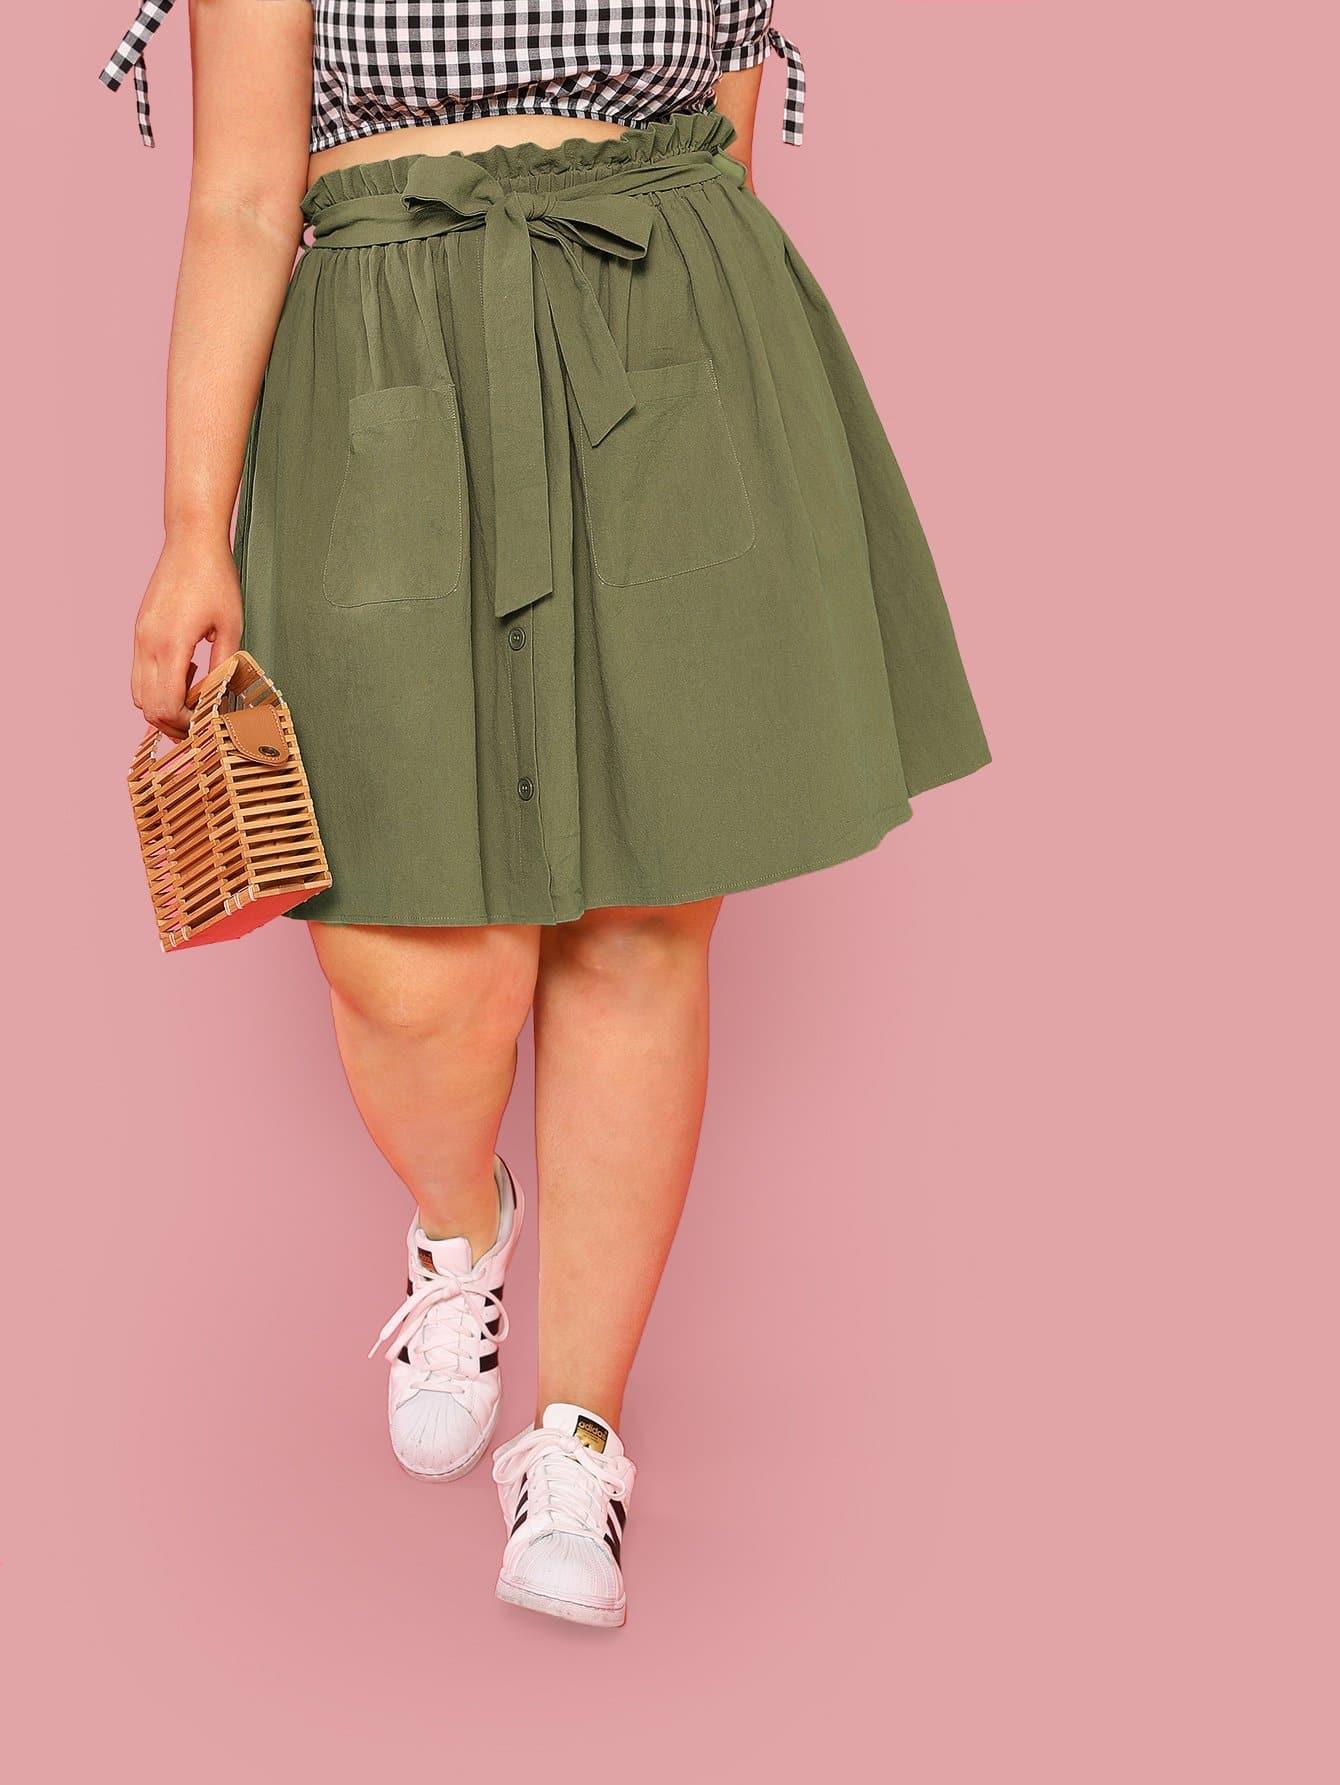 Belted Frilled Waist Pocket Patched Skirt high waist pocket patched dot skirt